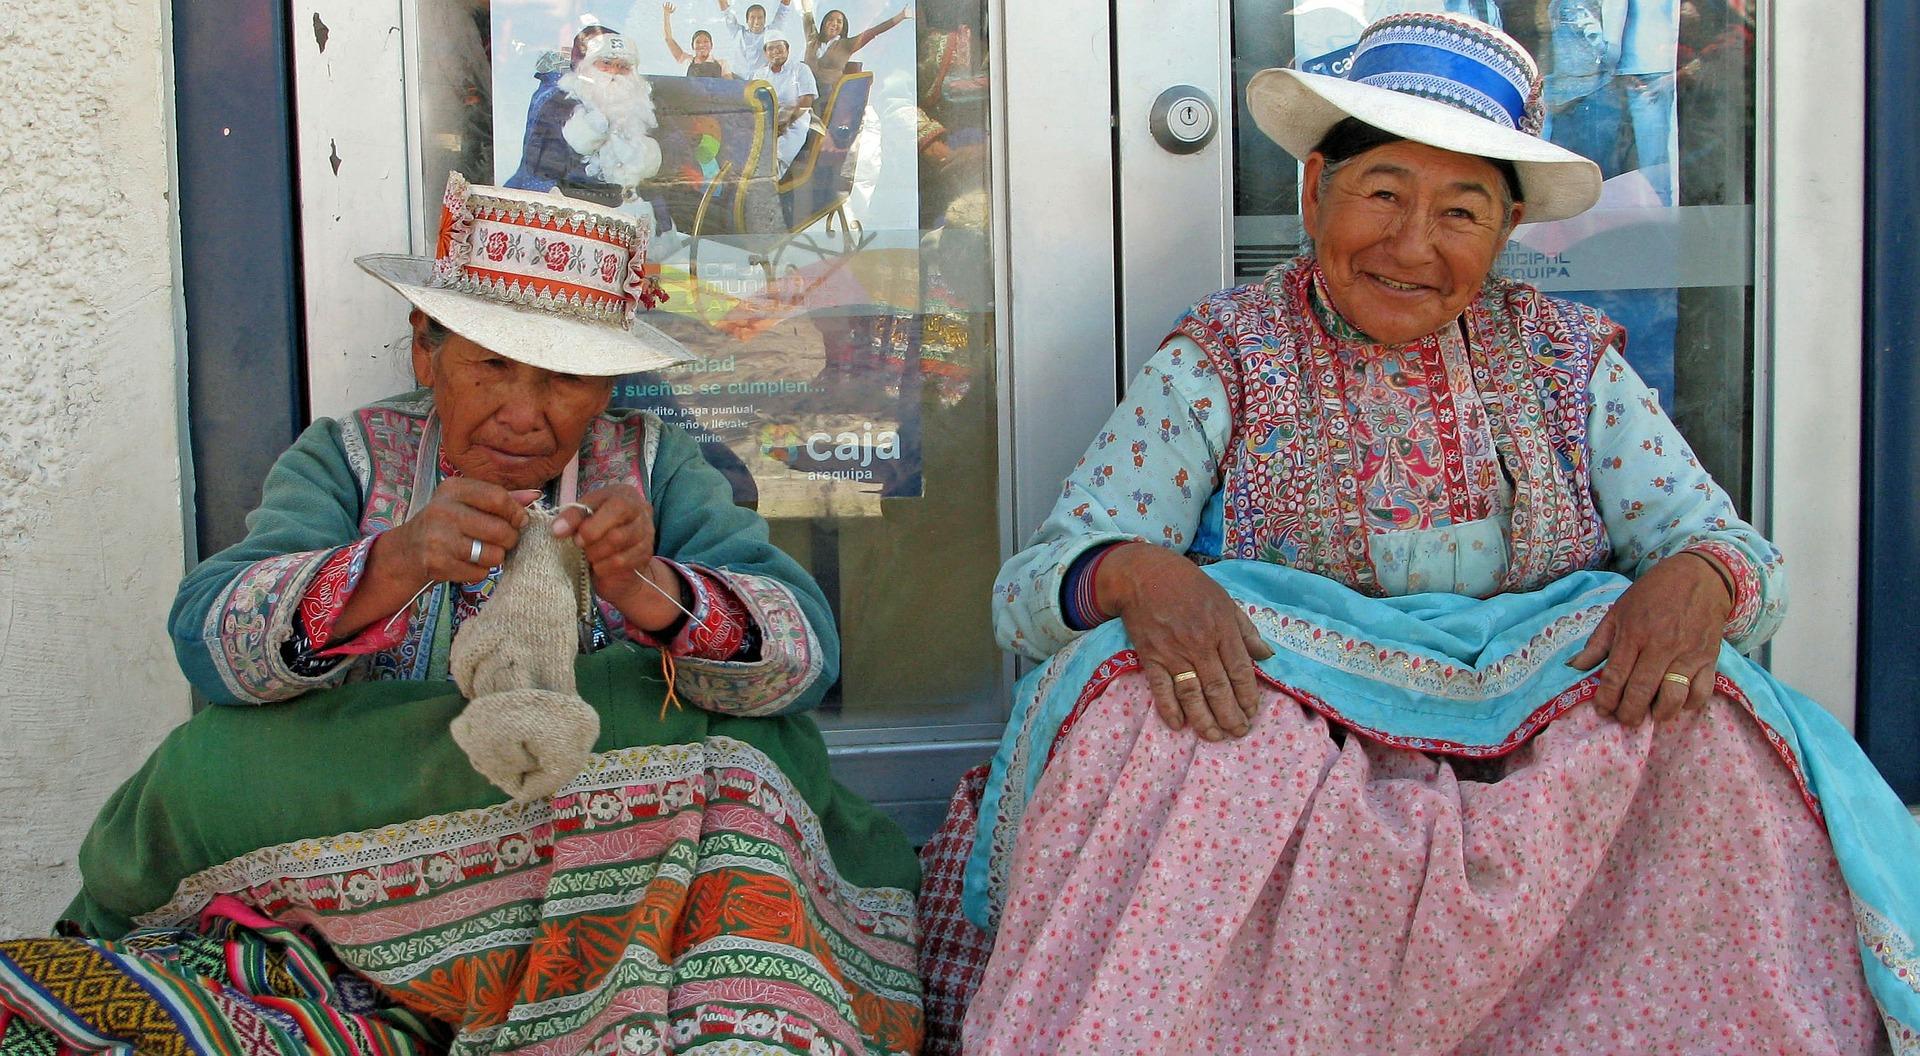 Peruvian costumes